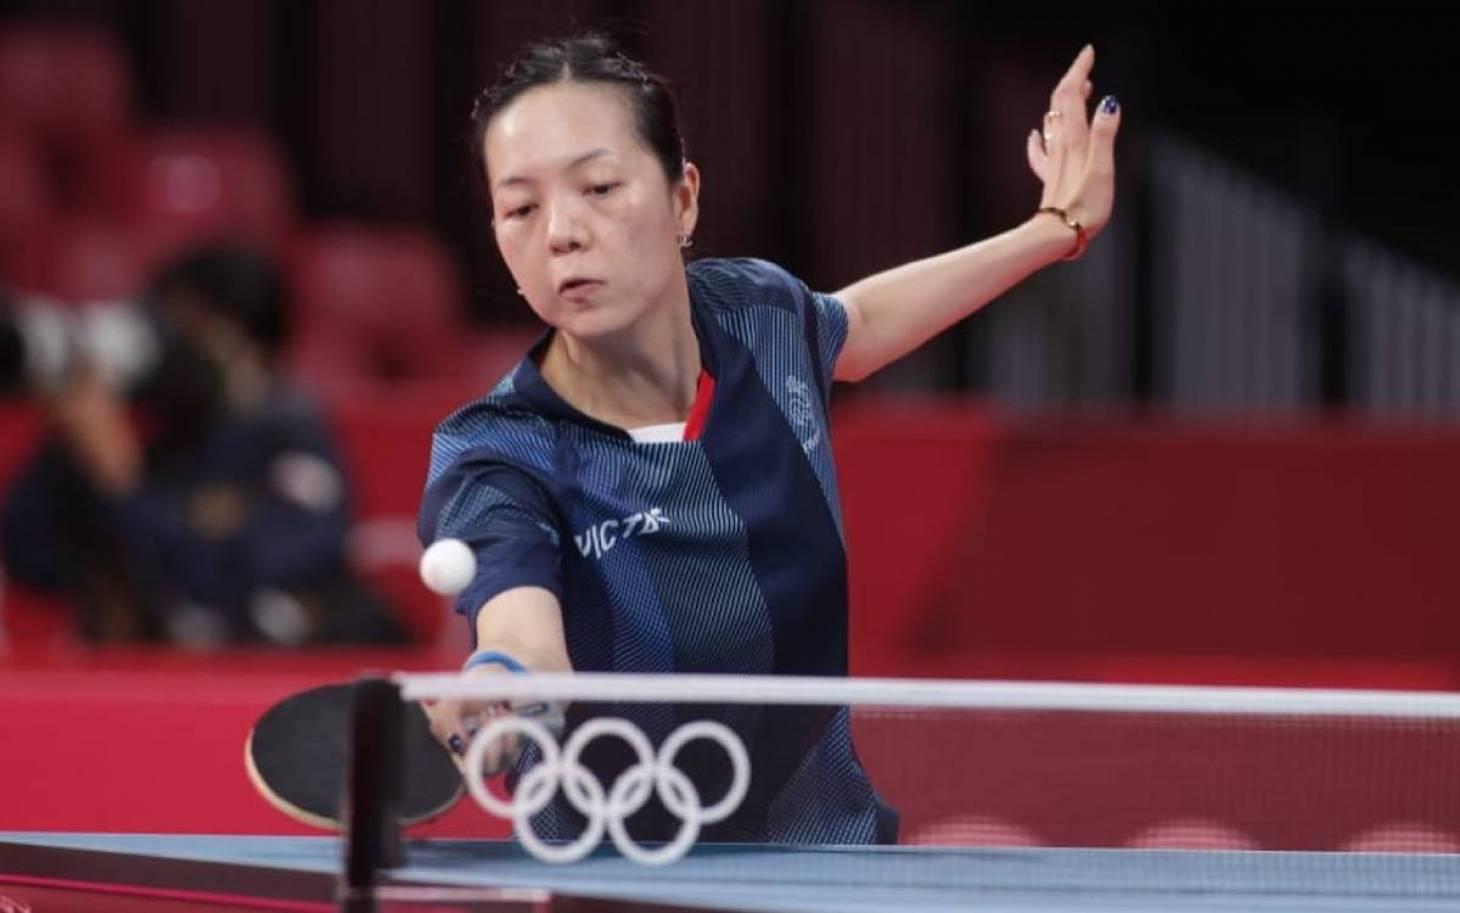 Tennis de table/JO de Tokyo - Jia Nan Yuan éliminée en simple féminin